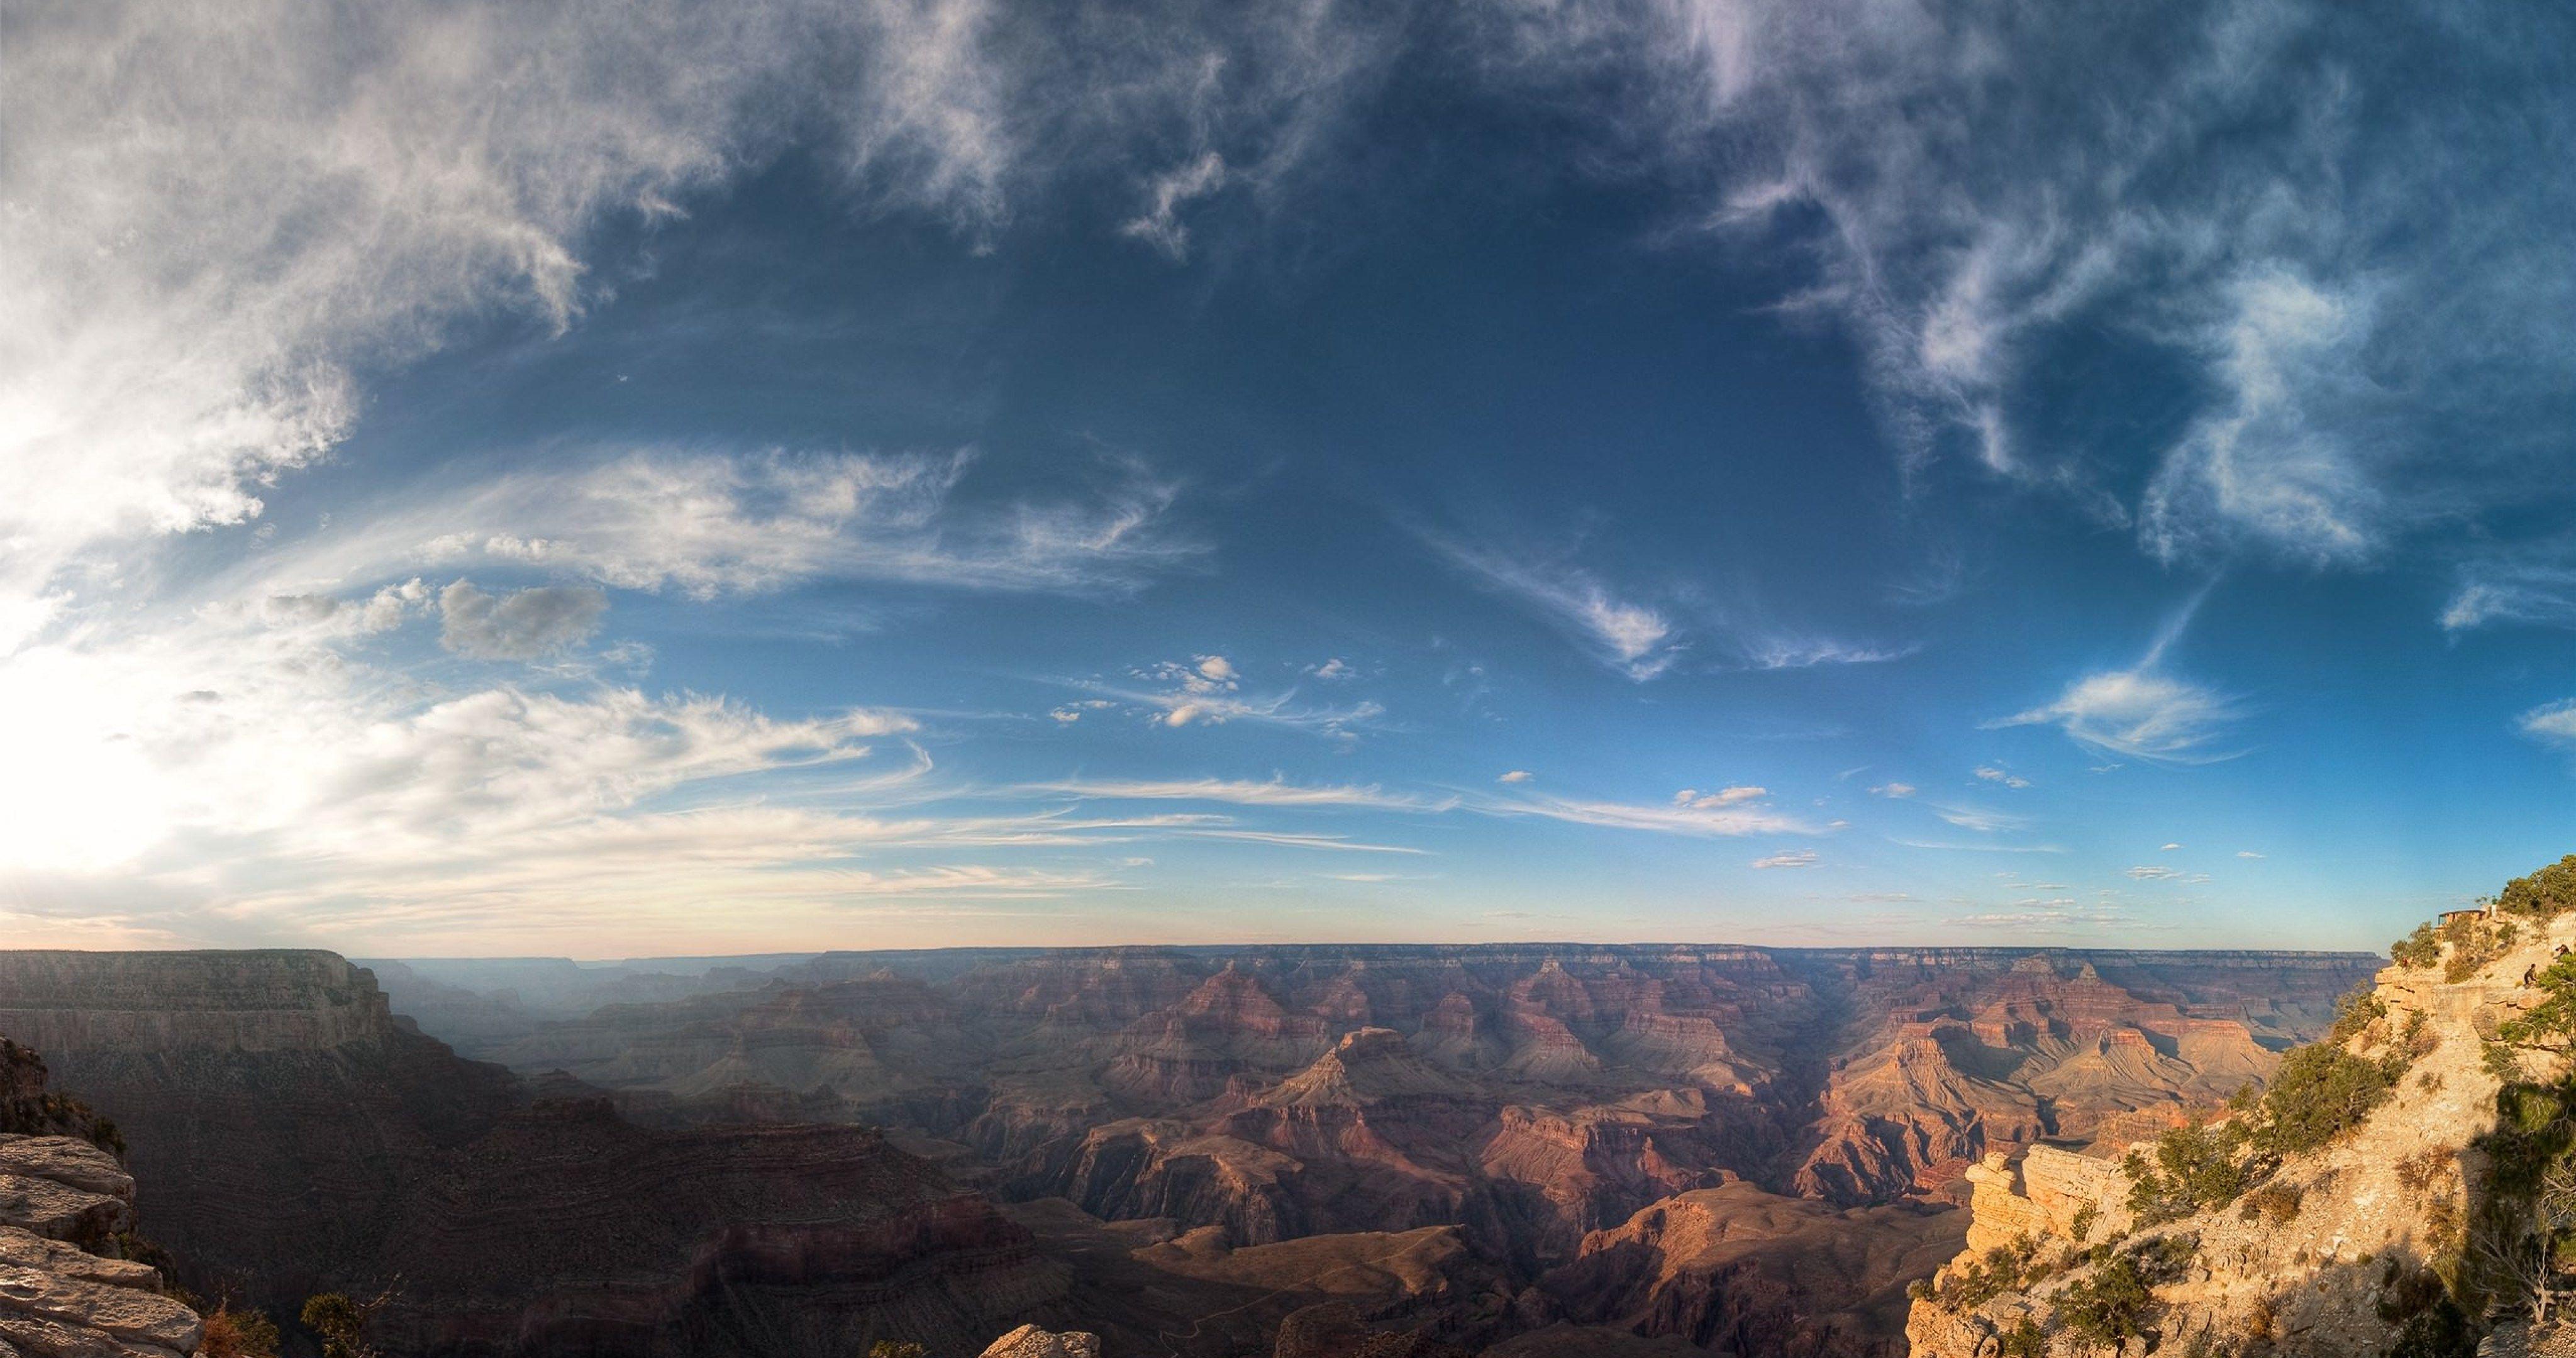 Amazing Wallpaper Mac Grand Canyon - 1c854fea6b05e1ad2121fd4907c5c3a3  Pic_515443.jpg